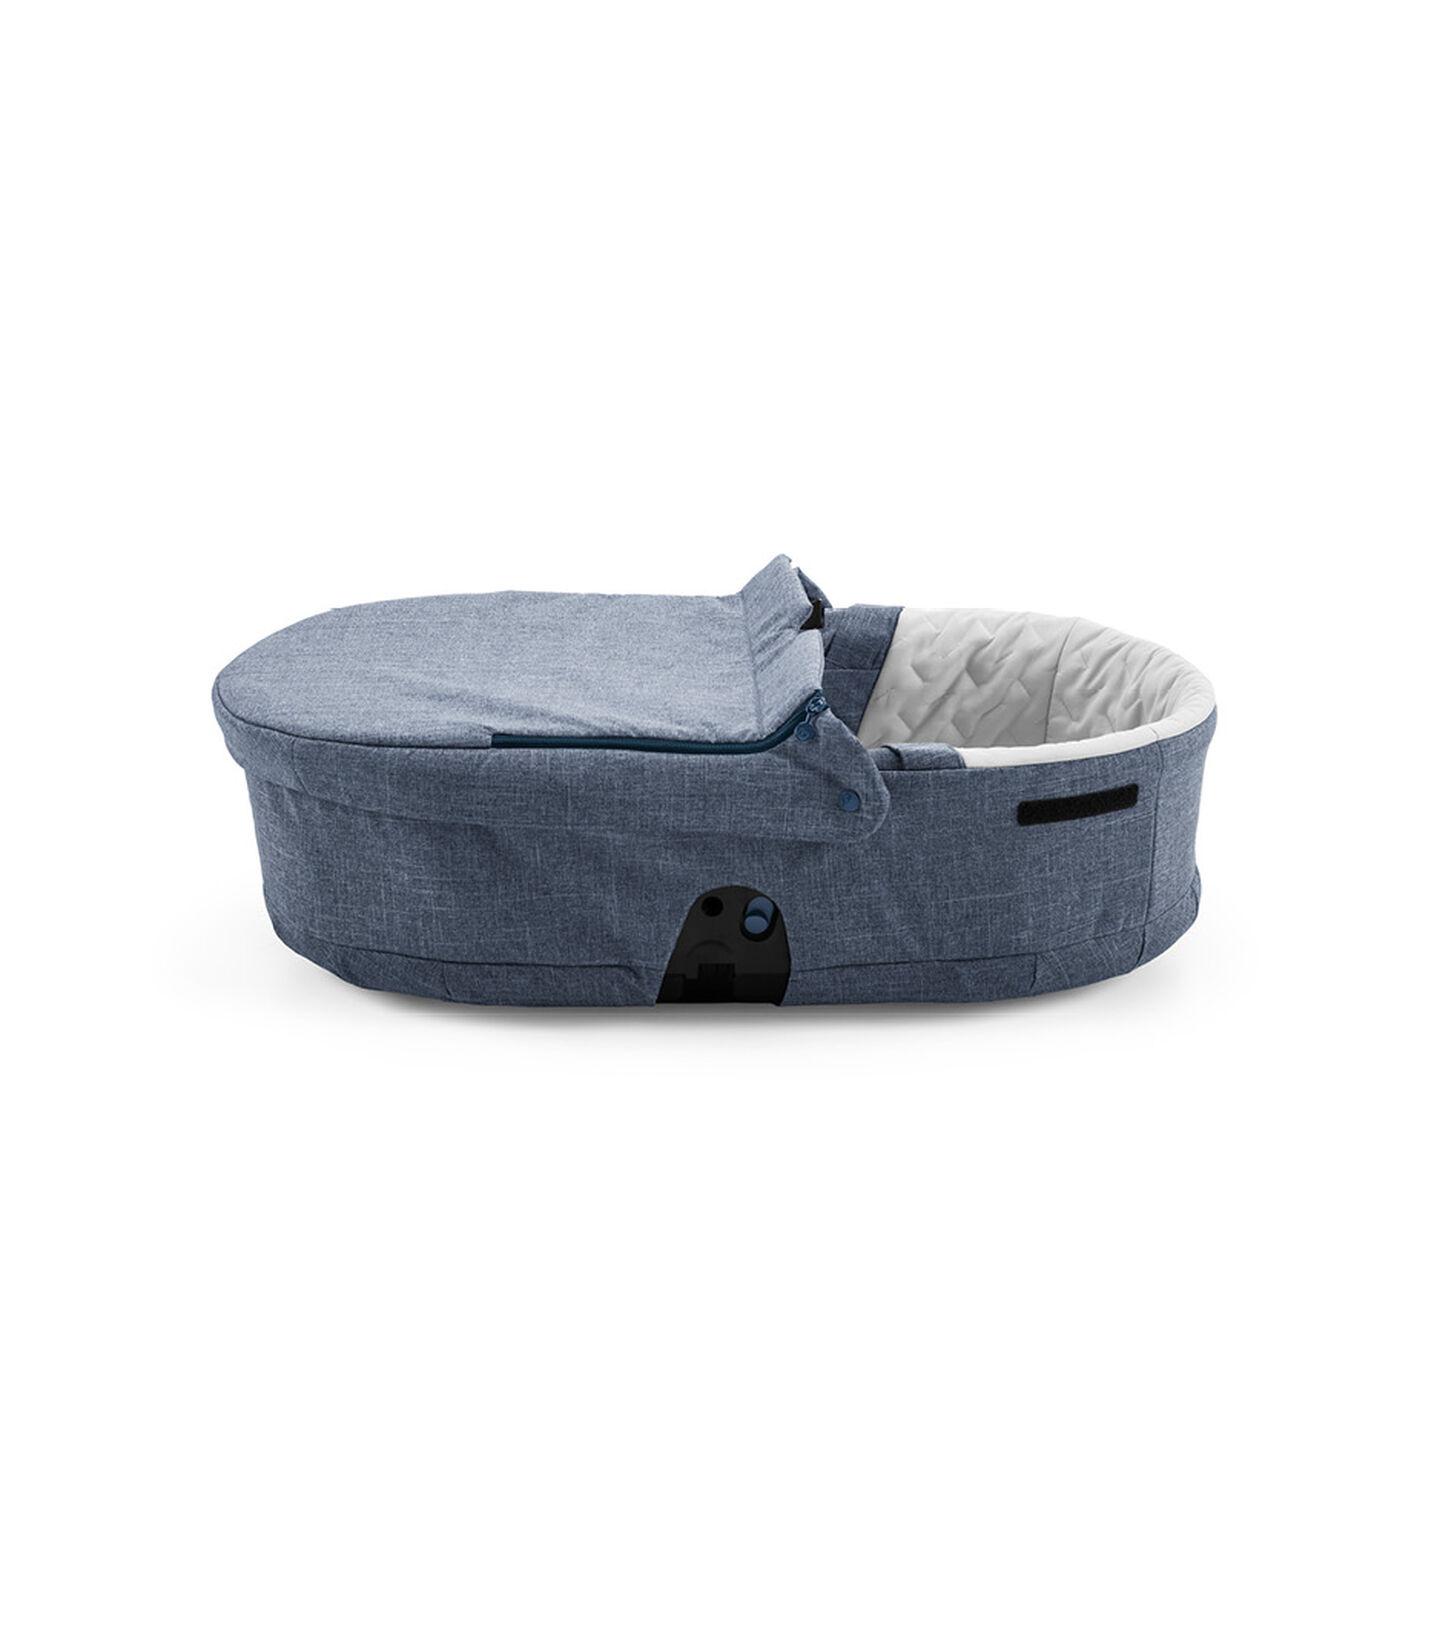 Stokke® Beat Carry Cot Blue Melange, Blue Melange, mainview view 1